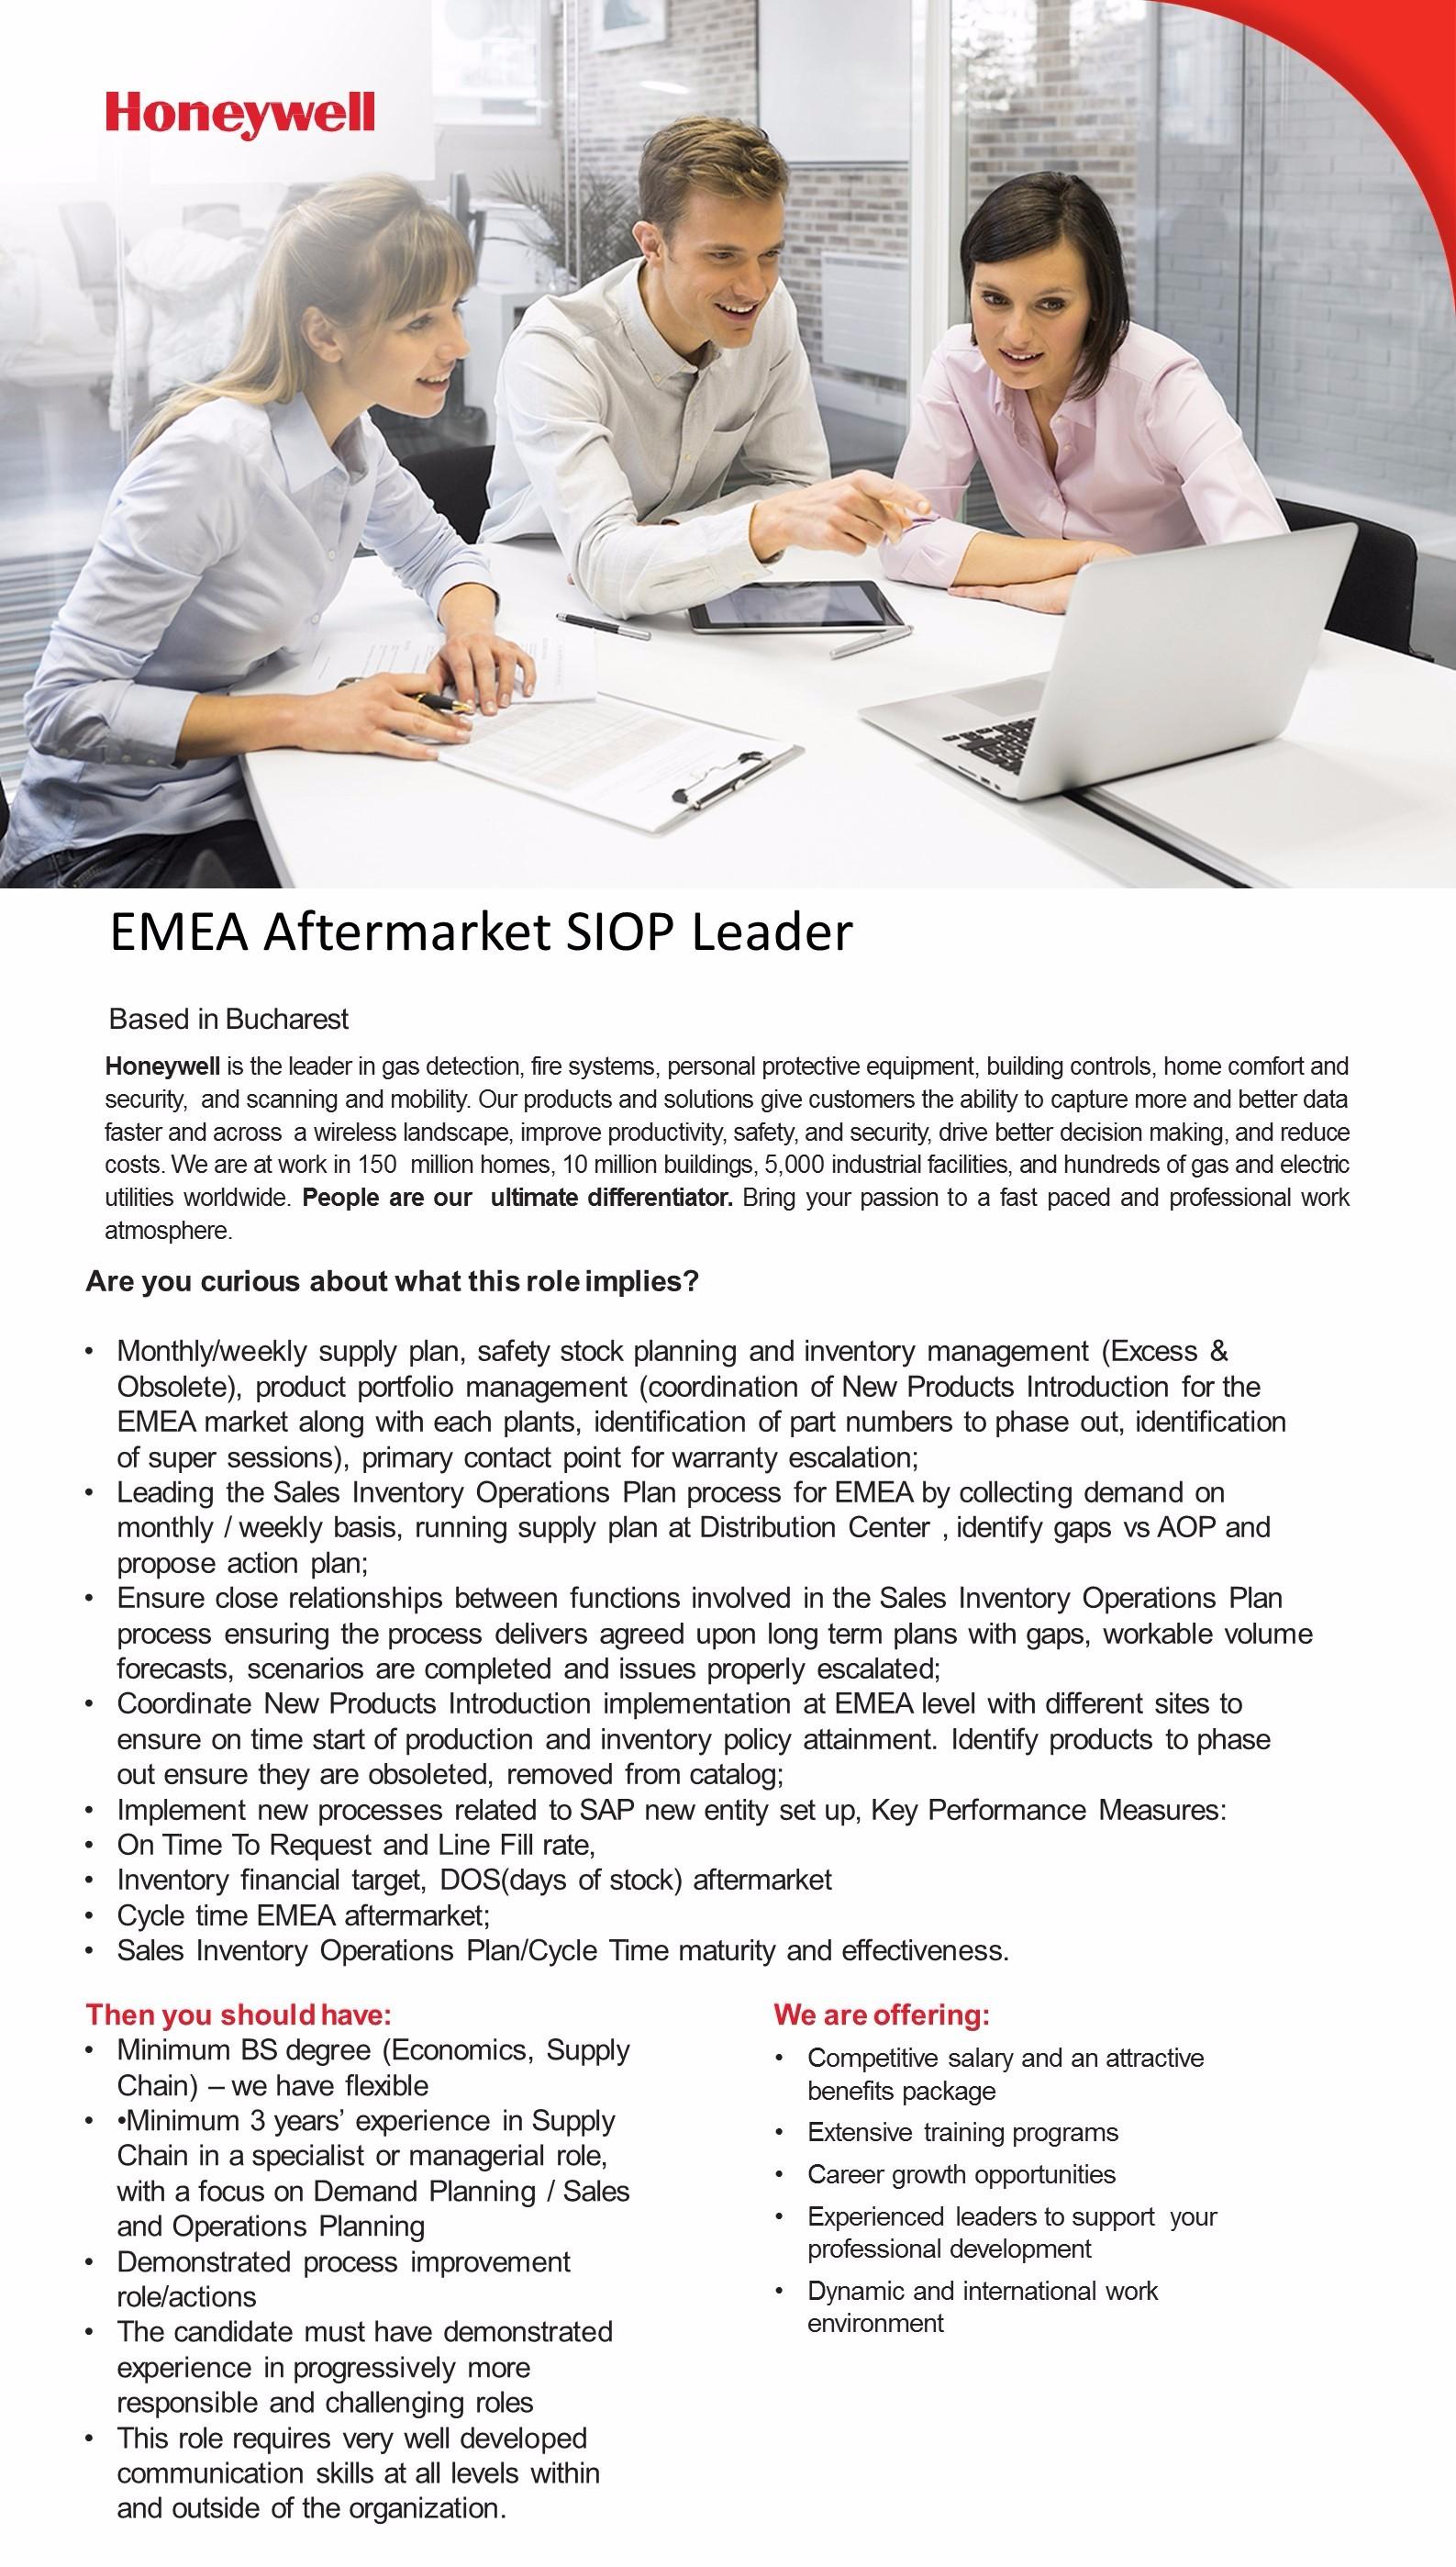 EMEA Aftermarket SIOP Leader